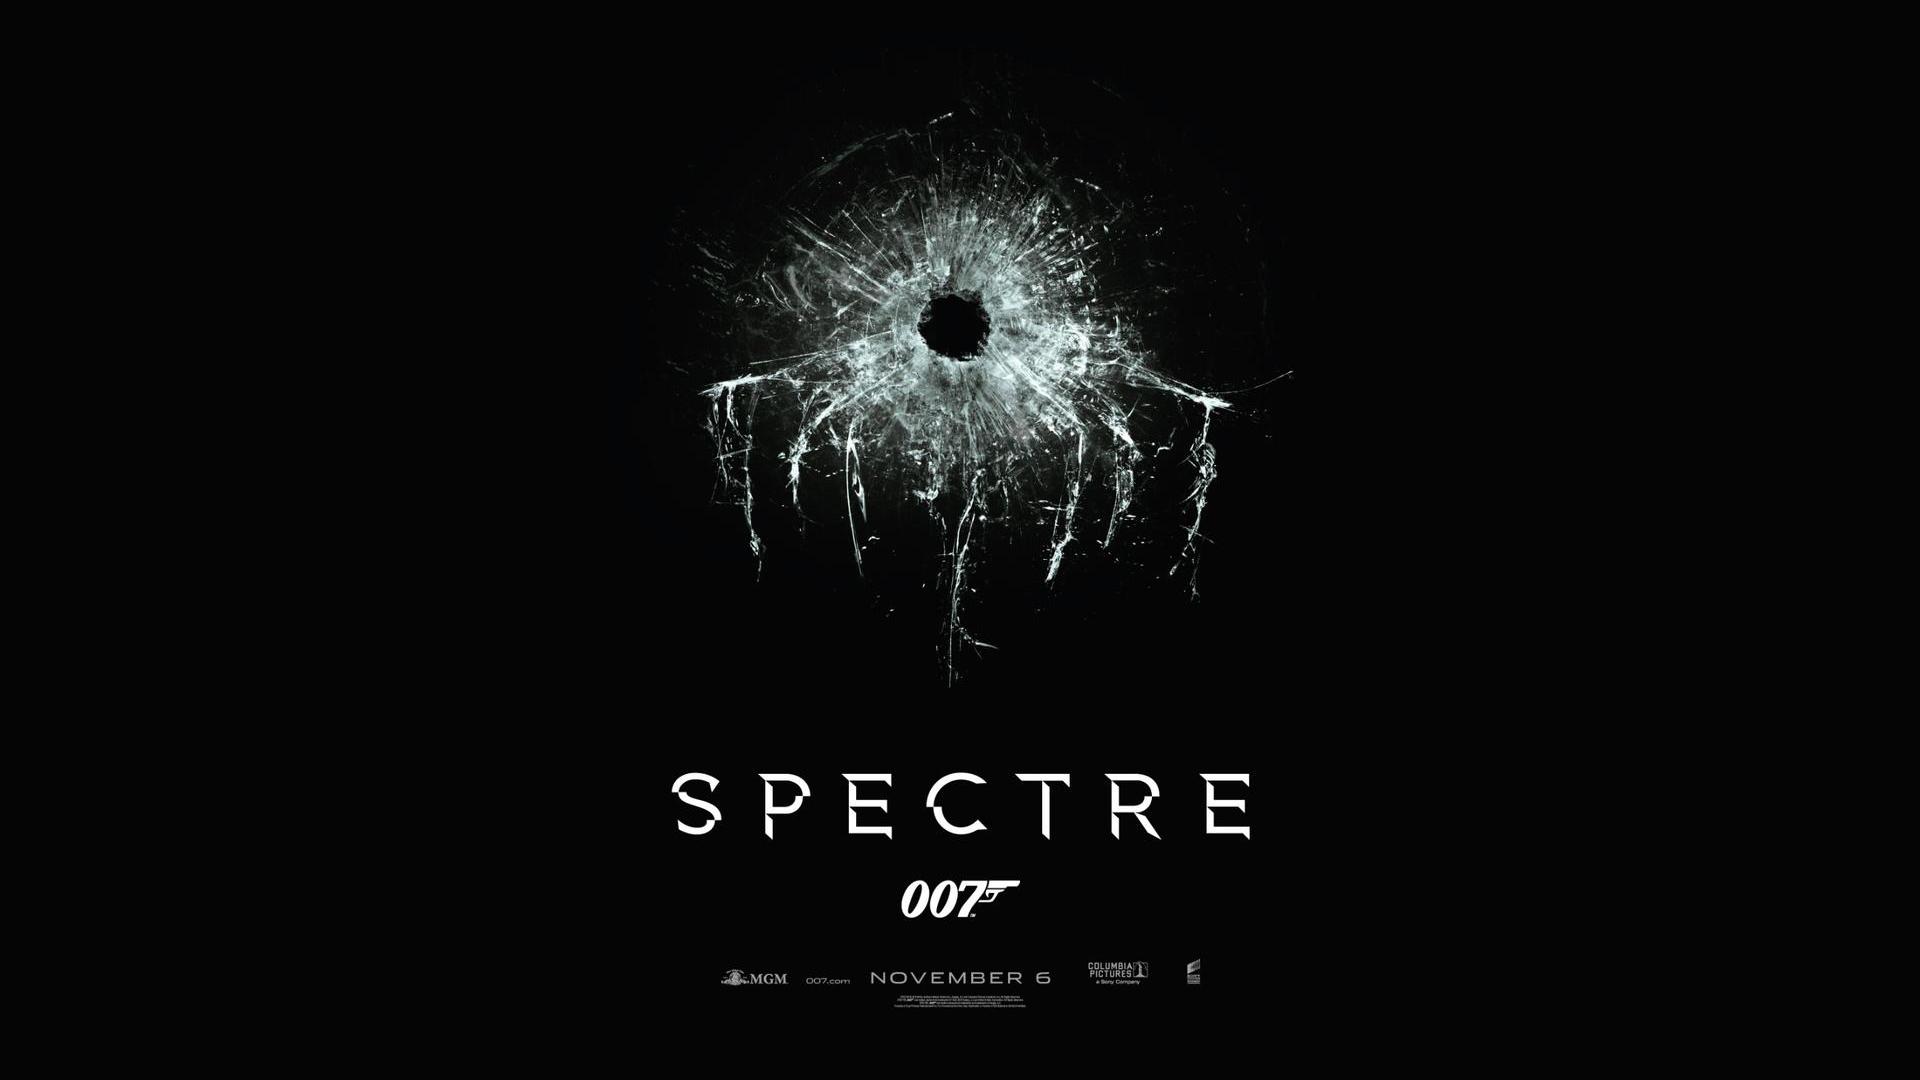 Spectre 007 con Daniel Craig